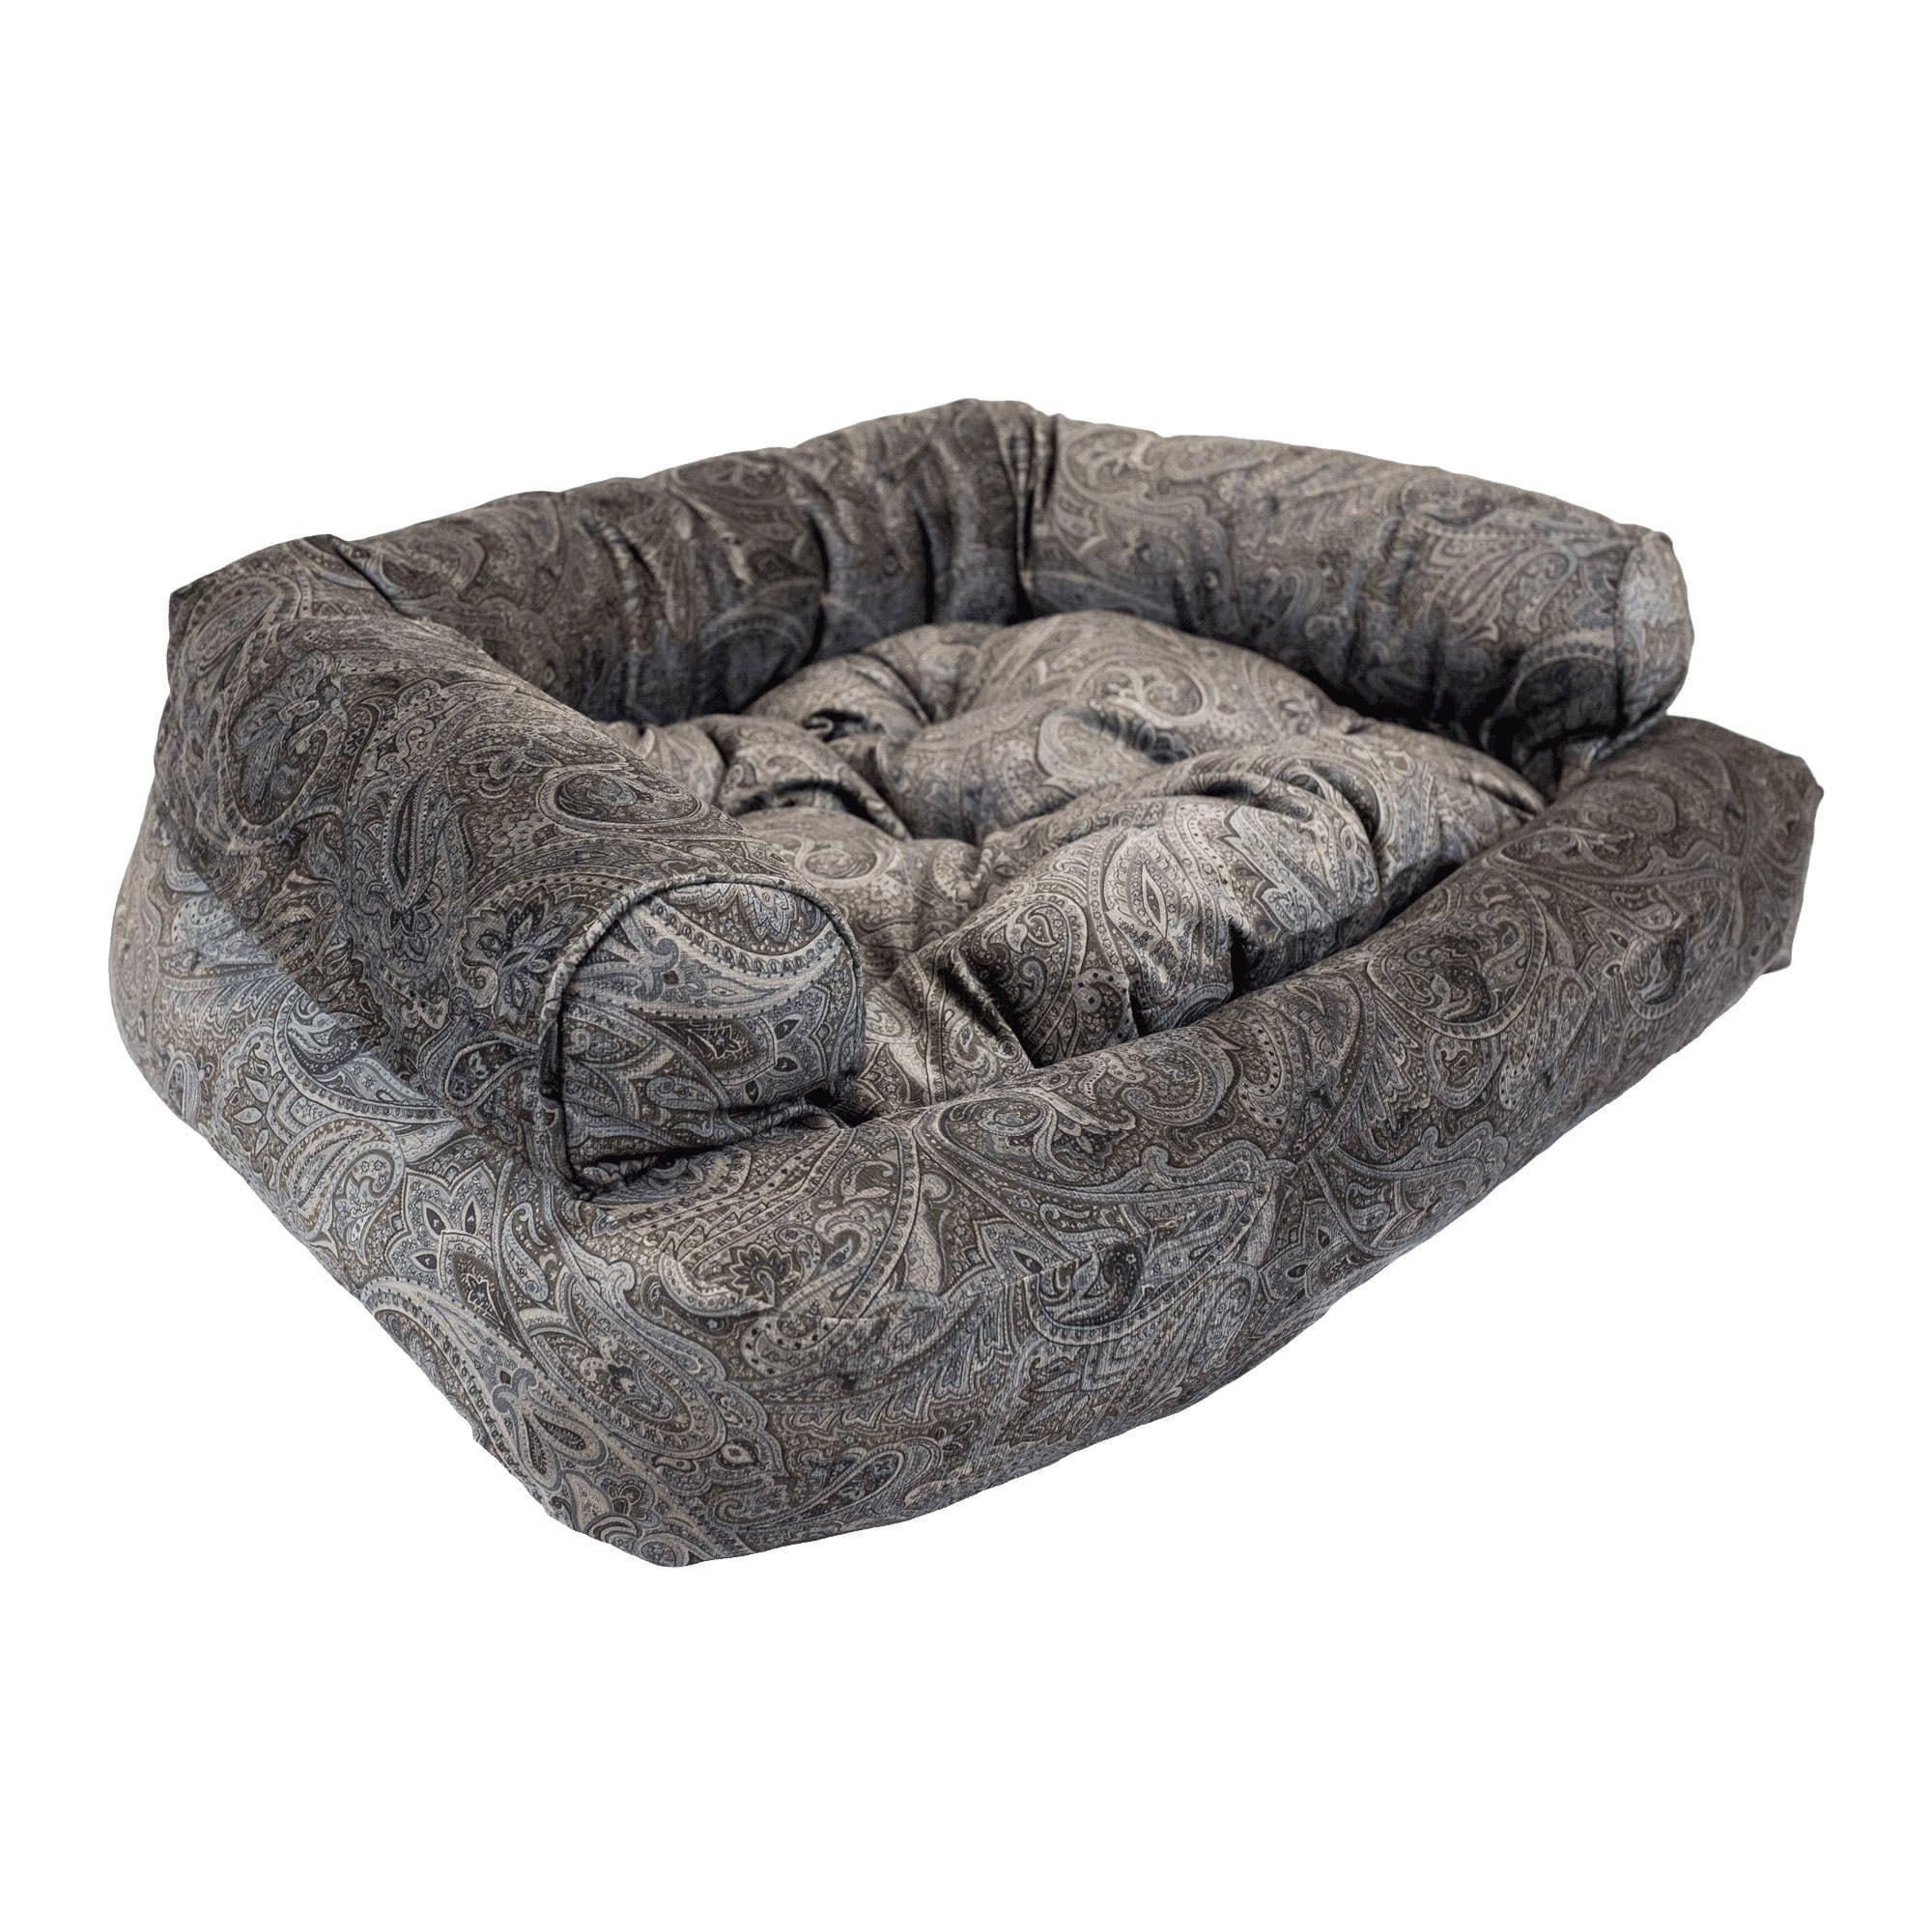 Snoozer Mocha Premium Overstuffed Laurel Pet Sofa (XLarge.